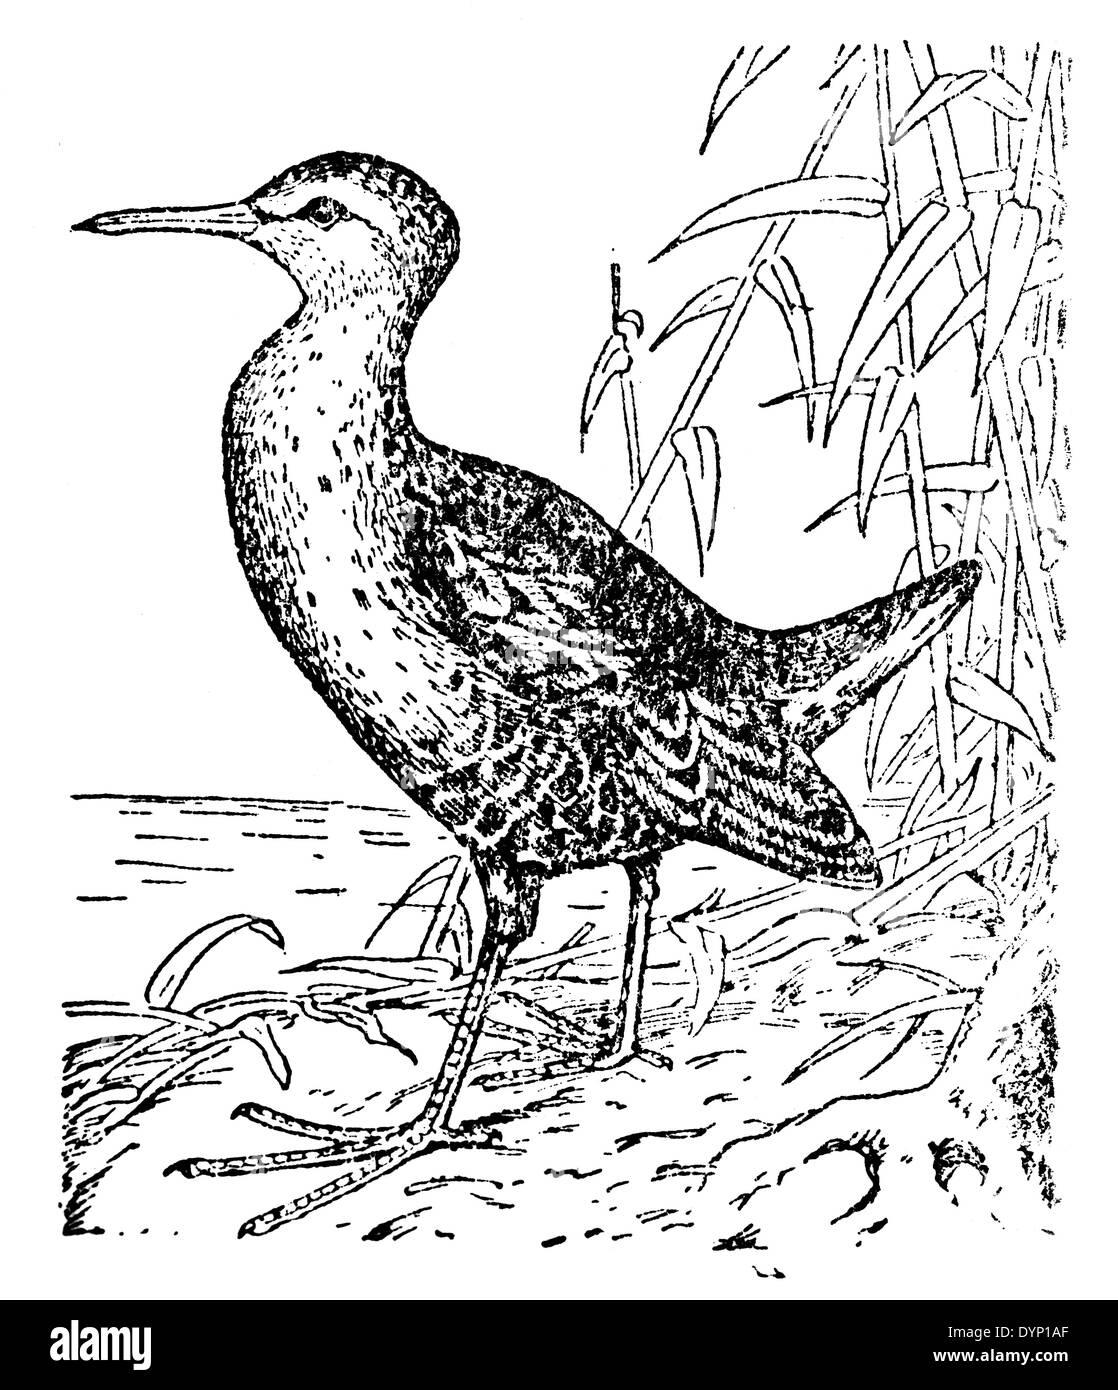 Water Rail (Rallus aquaticus), illustration from Soviet encyclopedia, 1928 - Stock Image